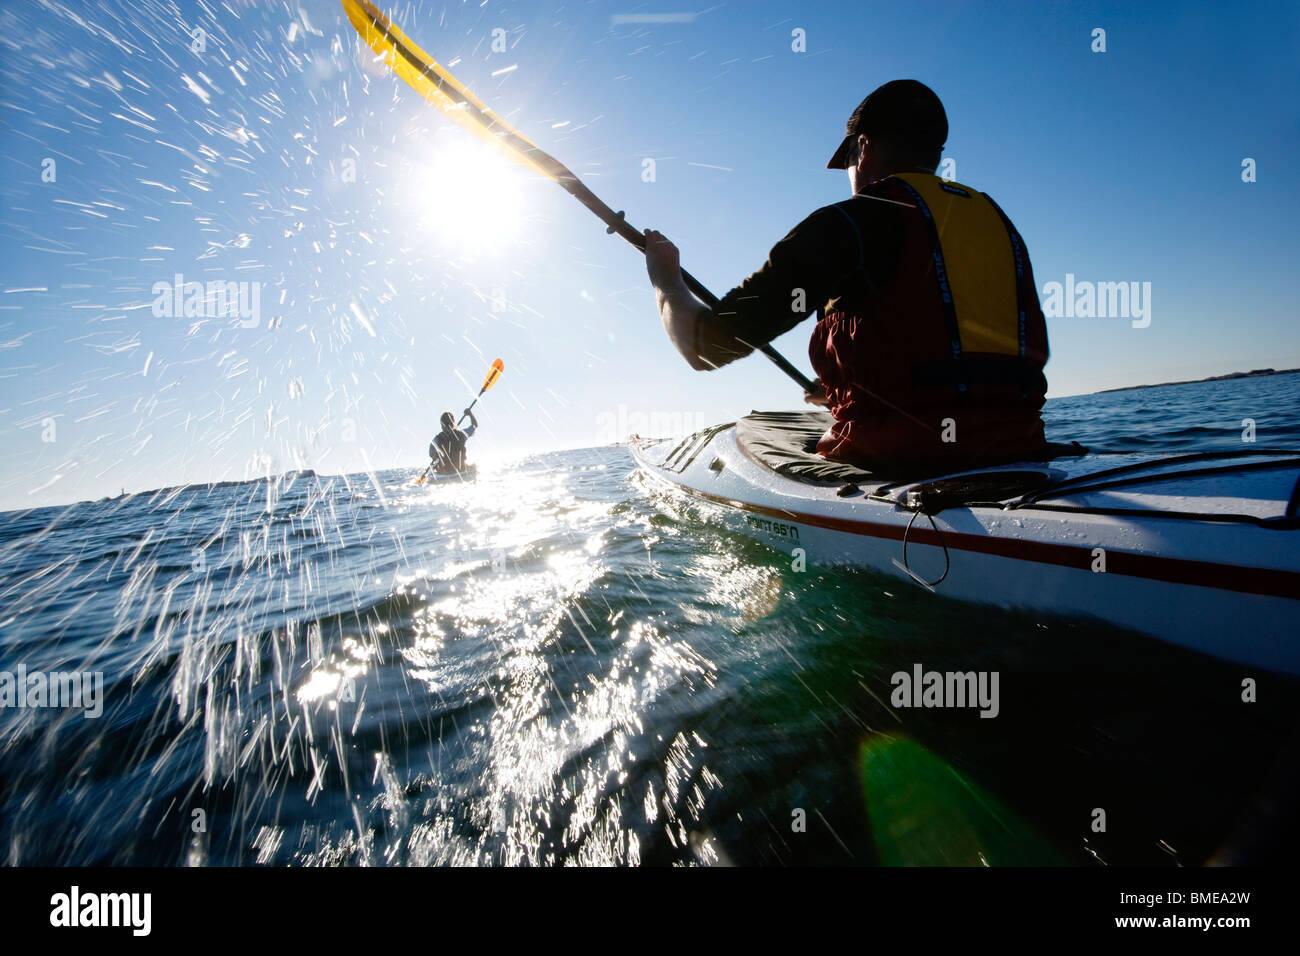 Persone kayak, Svezia. Immagini Stock